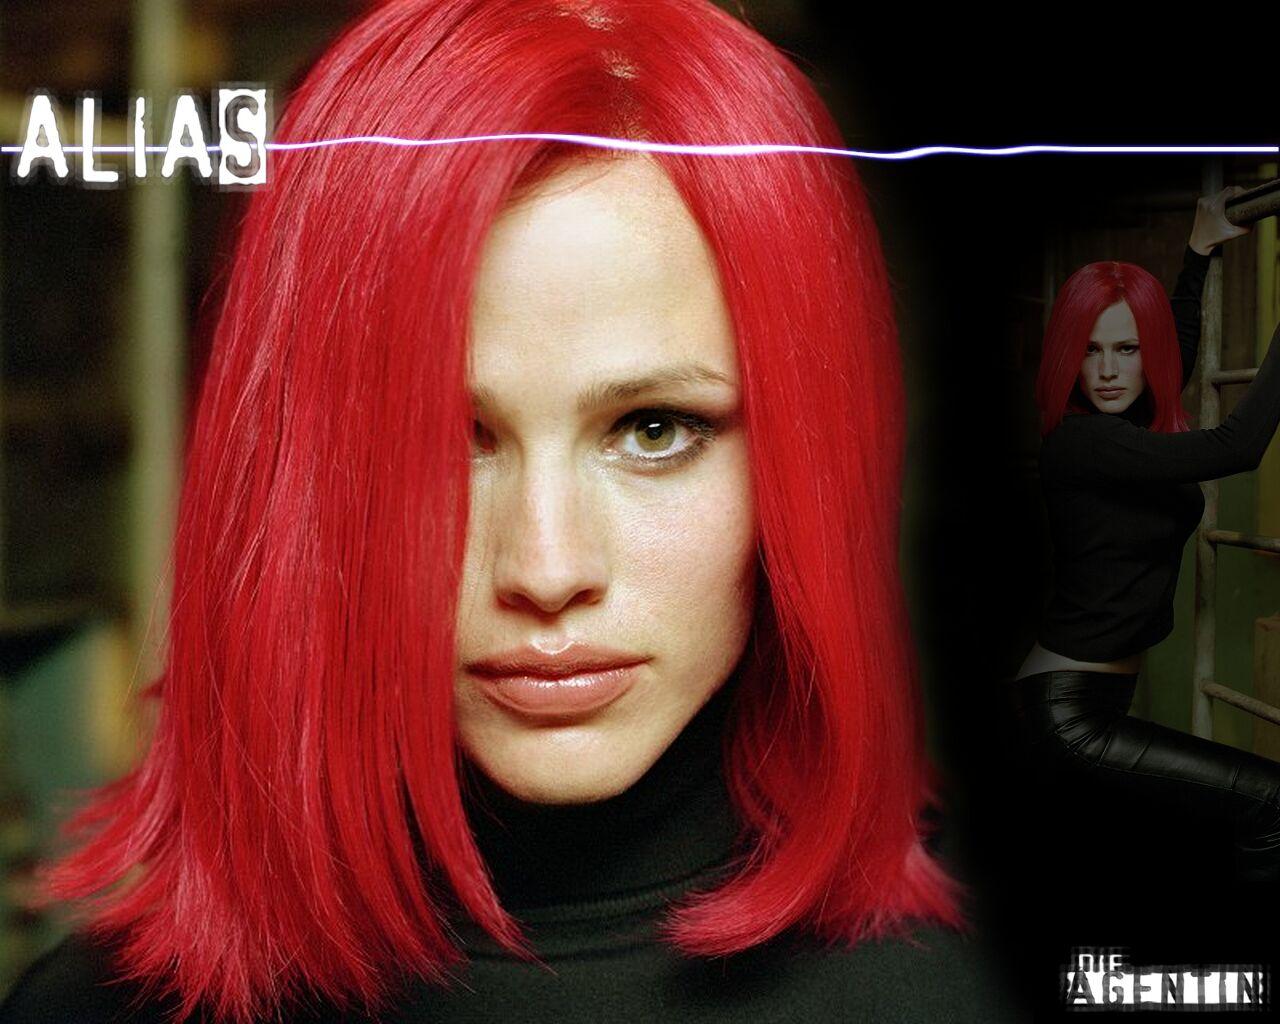 Wallpaper Jennifer Garner Alias cheuveux rouges